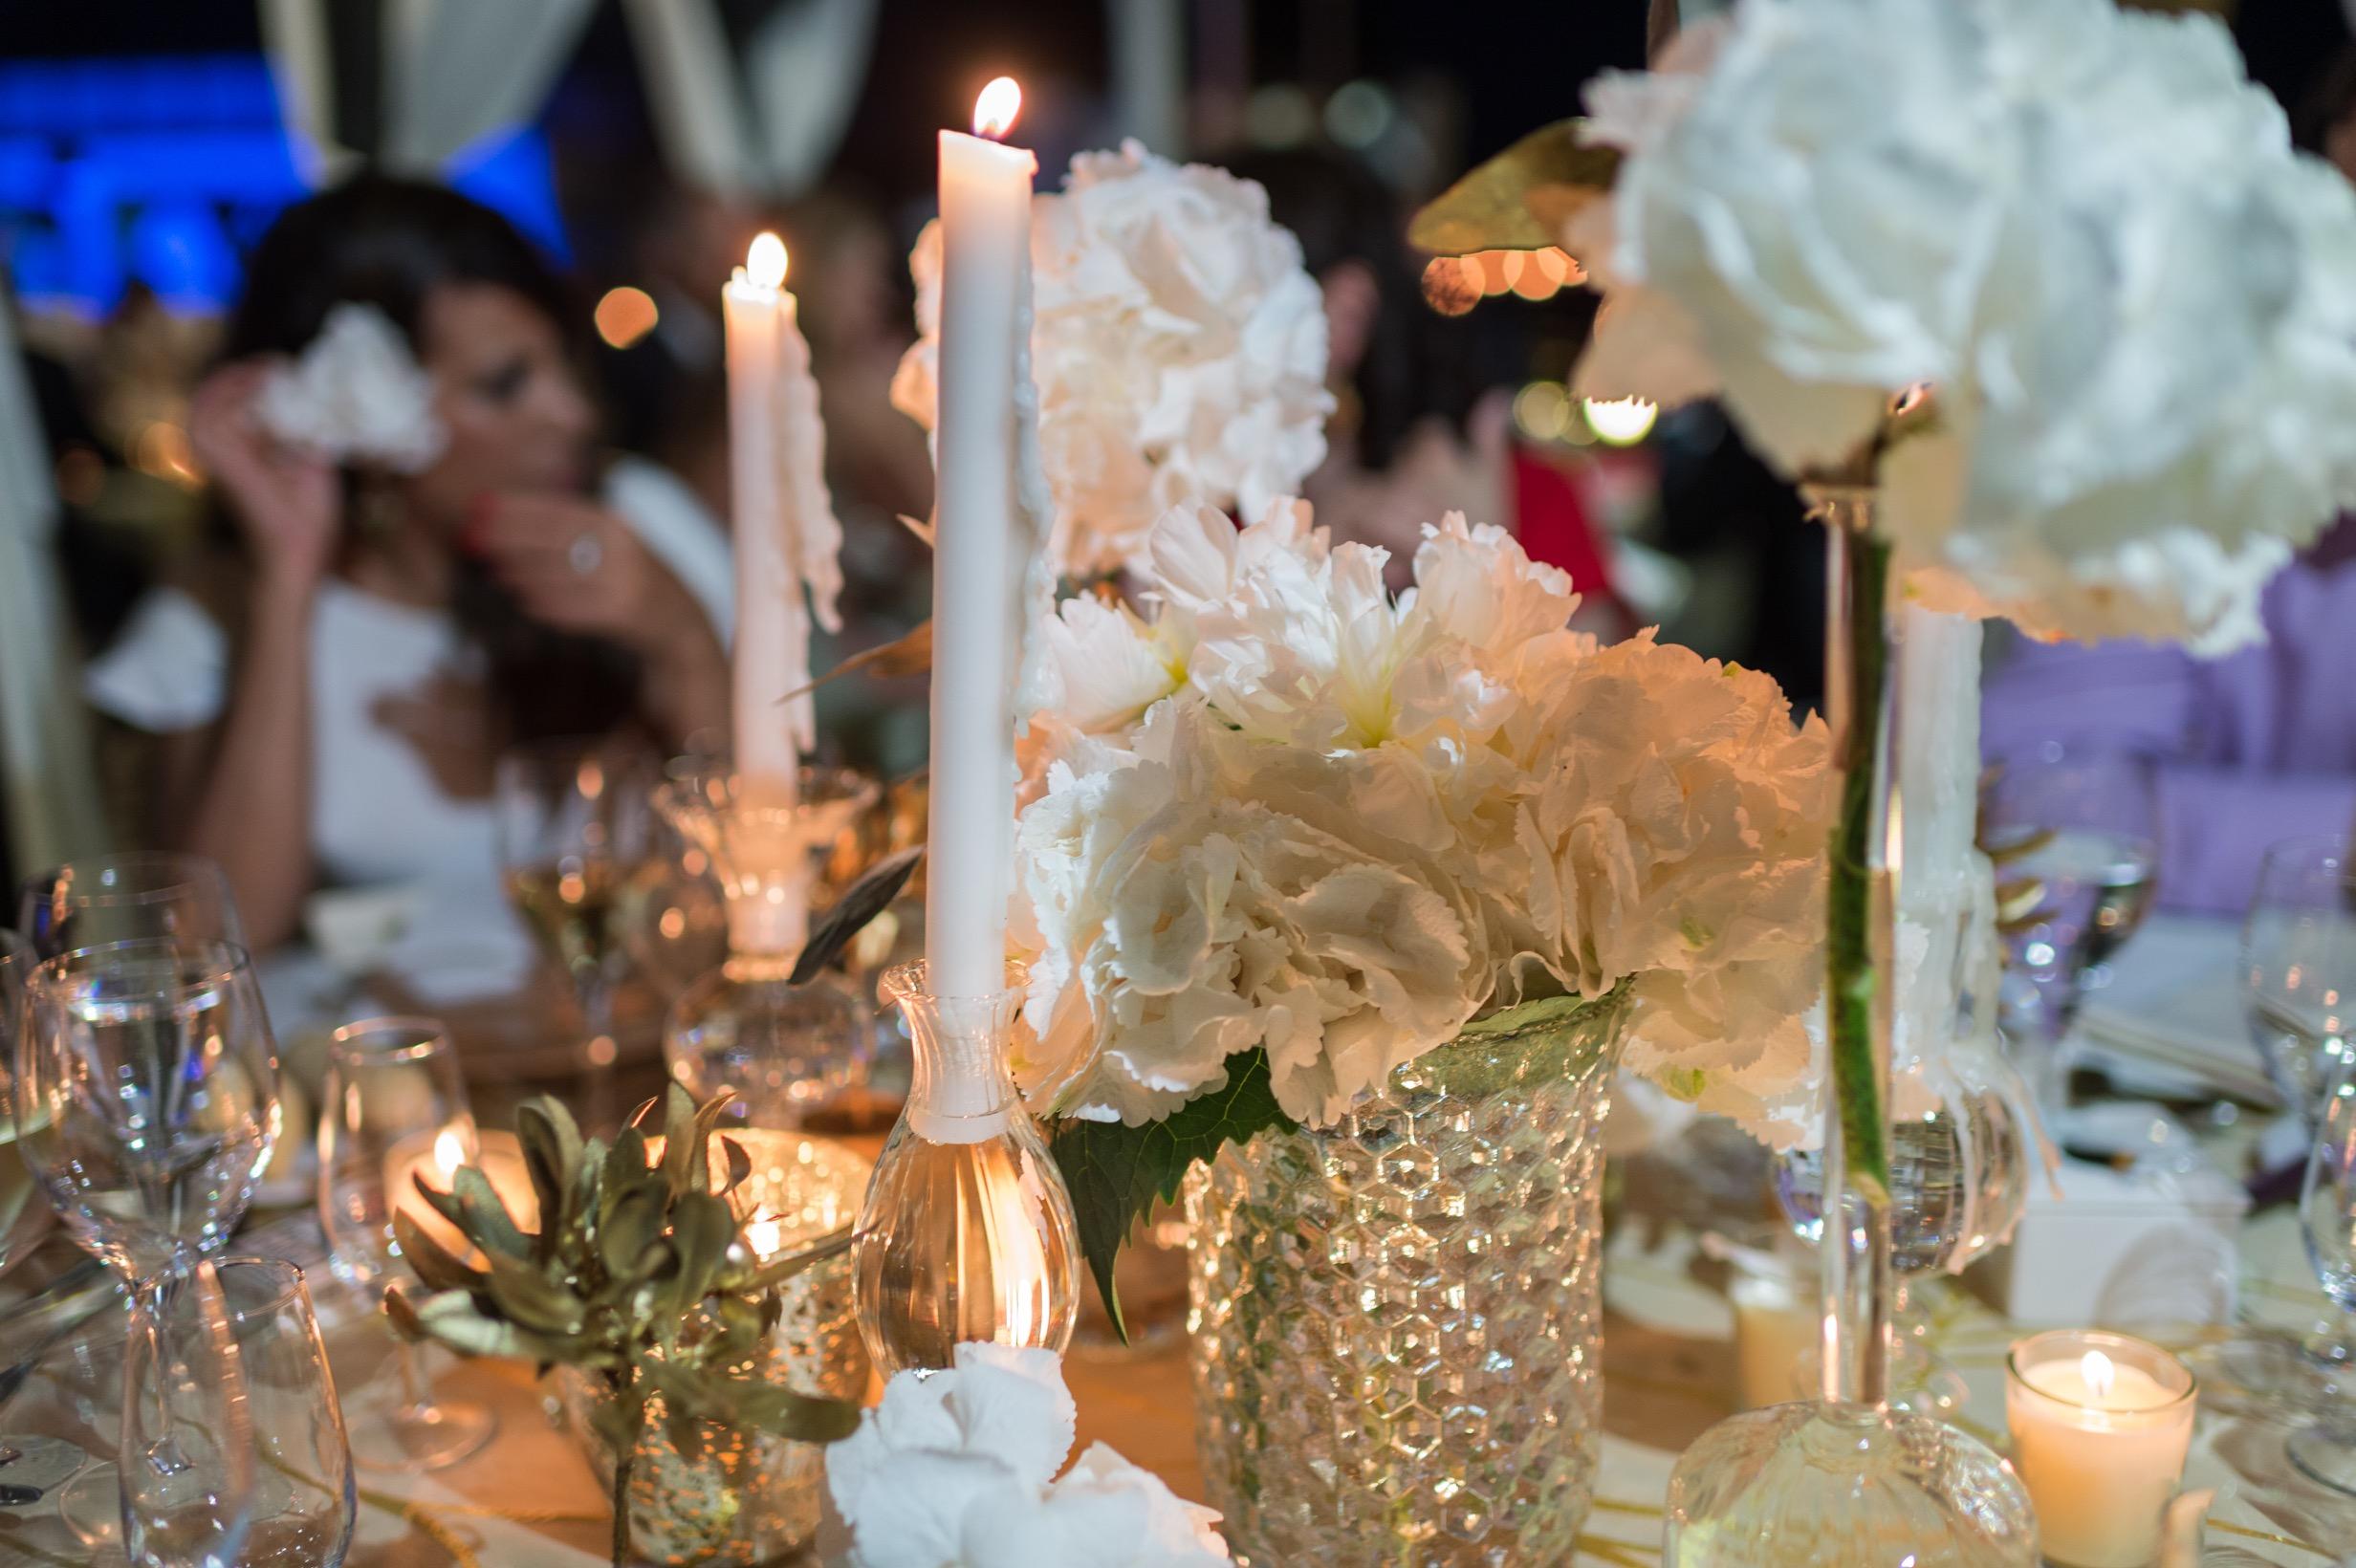 0ASi-Quiero-Wedding-Planner-By-Sira-Antequera-Bodas-Málaga-Marbella-Miami-Sandra-Rafa-18